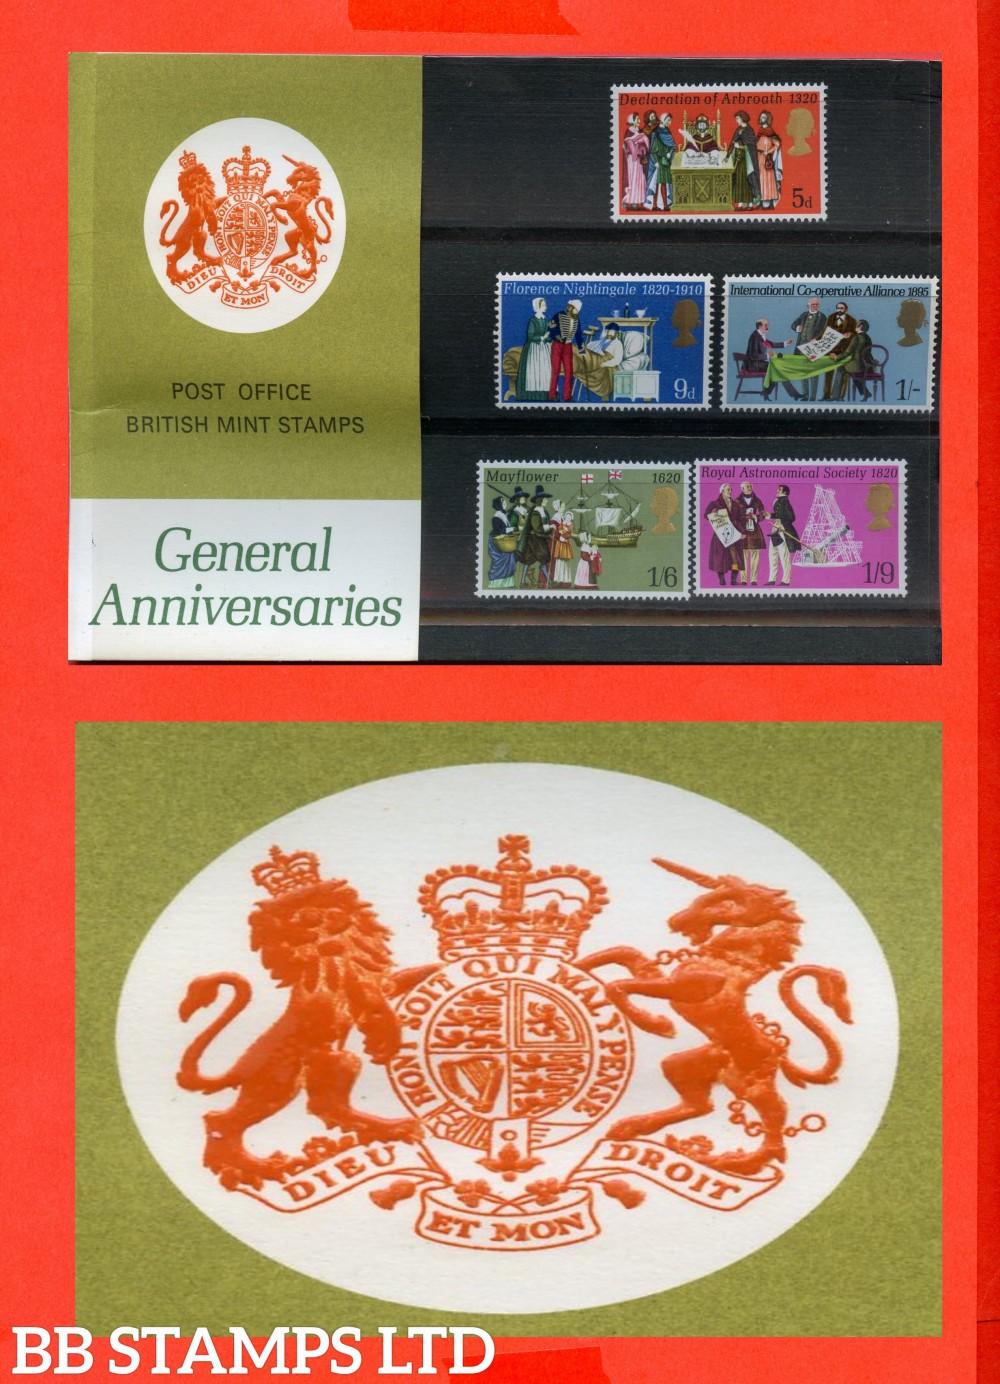 1970 General Anniversaries (Pres Pack is Type D = Chain Missing, Marjorie Spelt Incorrect, Descendants Spelt Incorrect